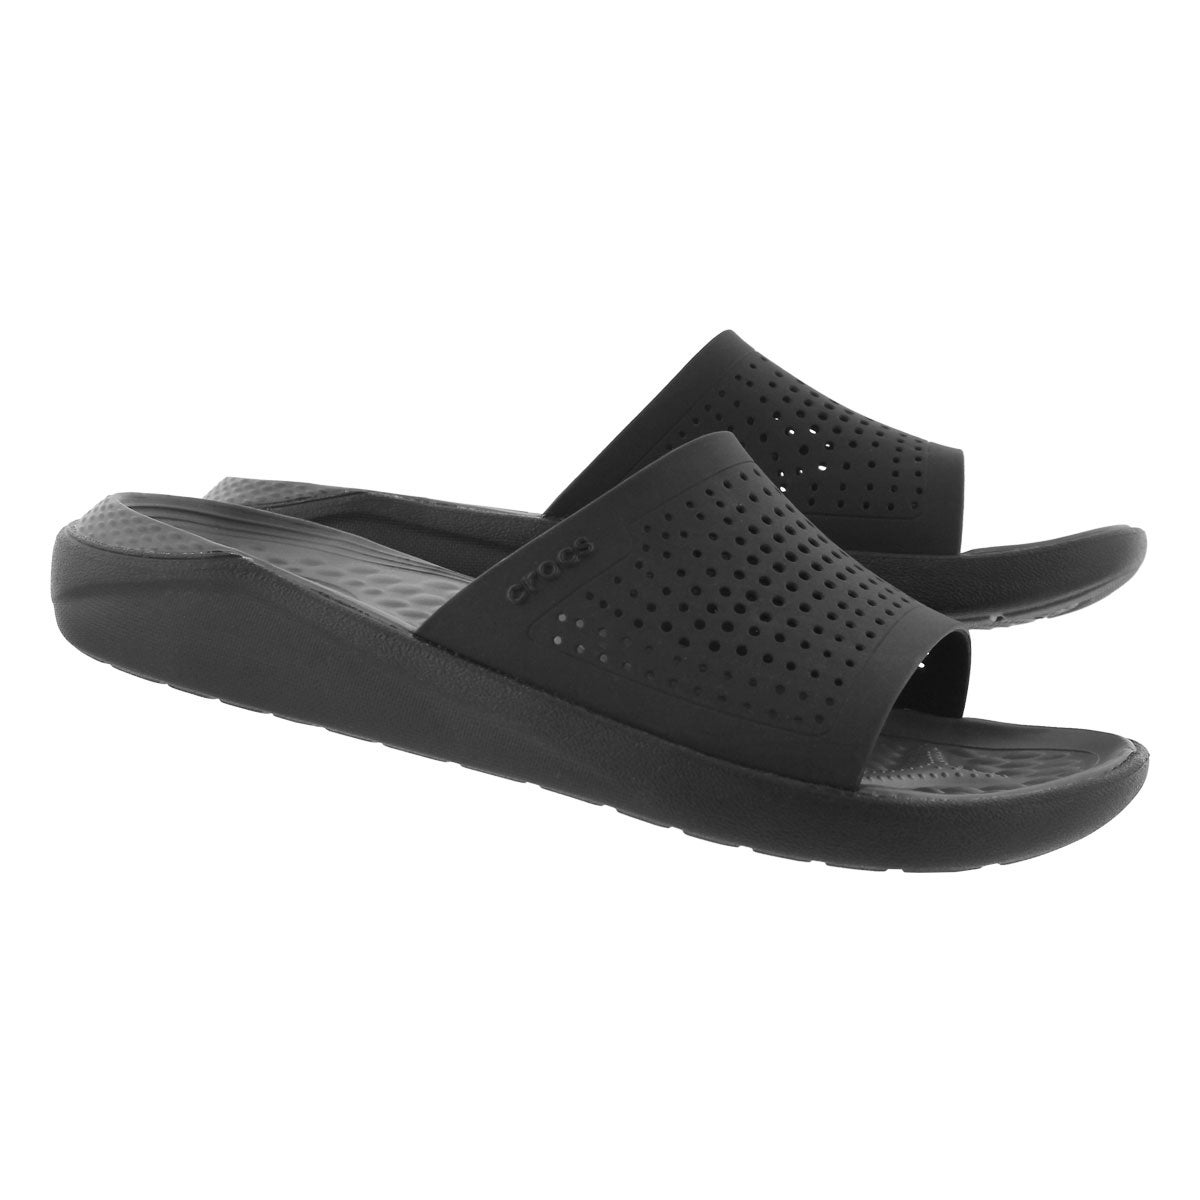 Sandales à enfiler LITERIDE, noir/ardoise, hommes